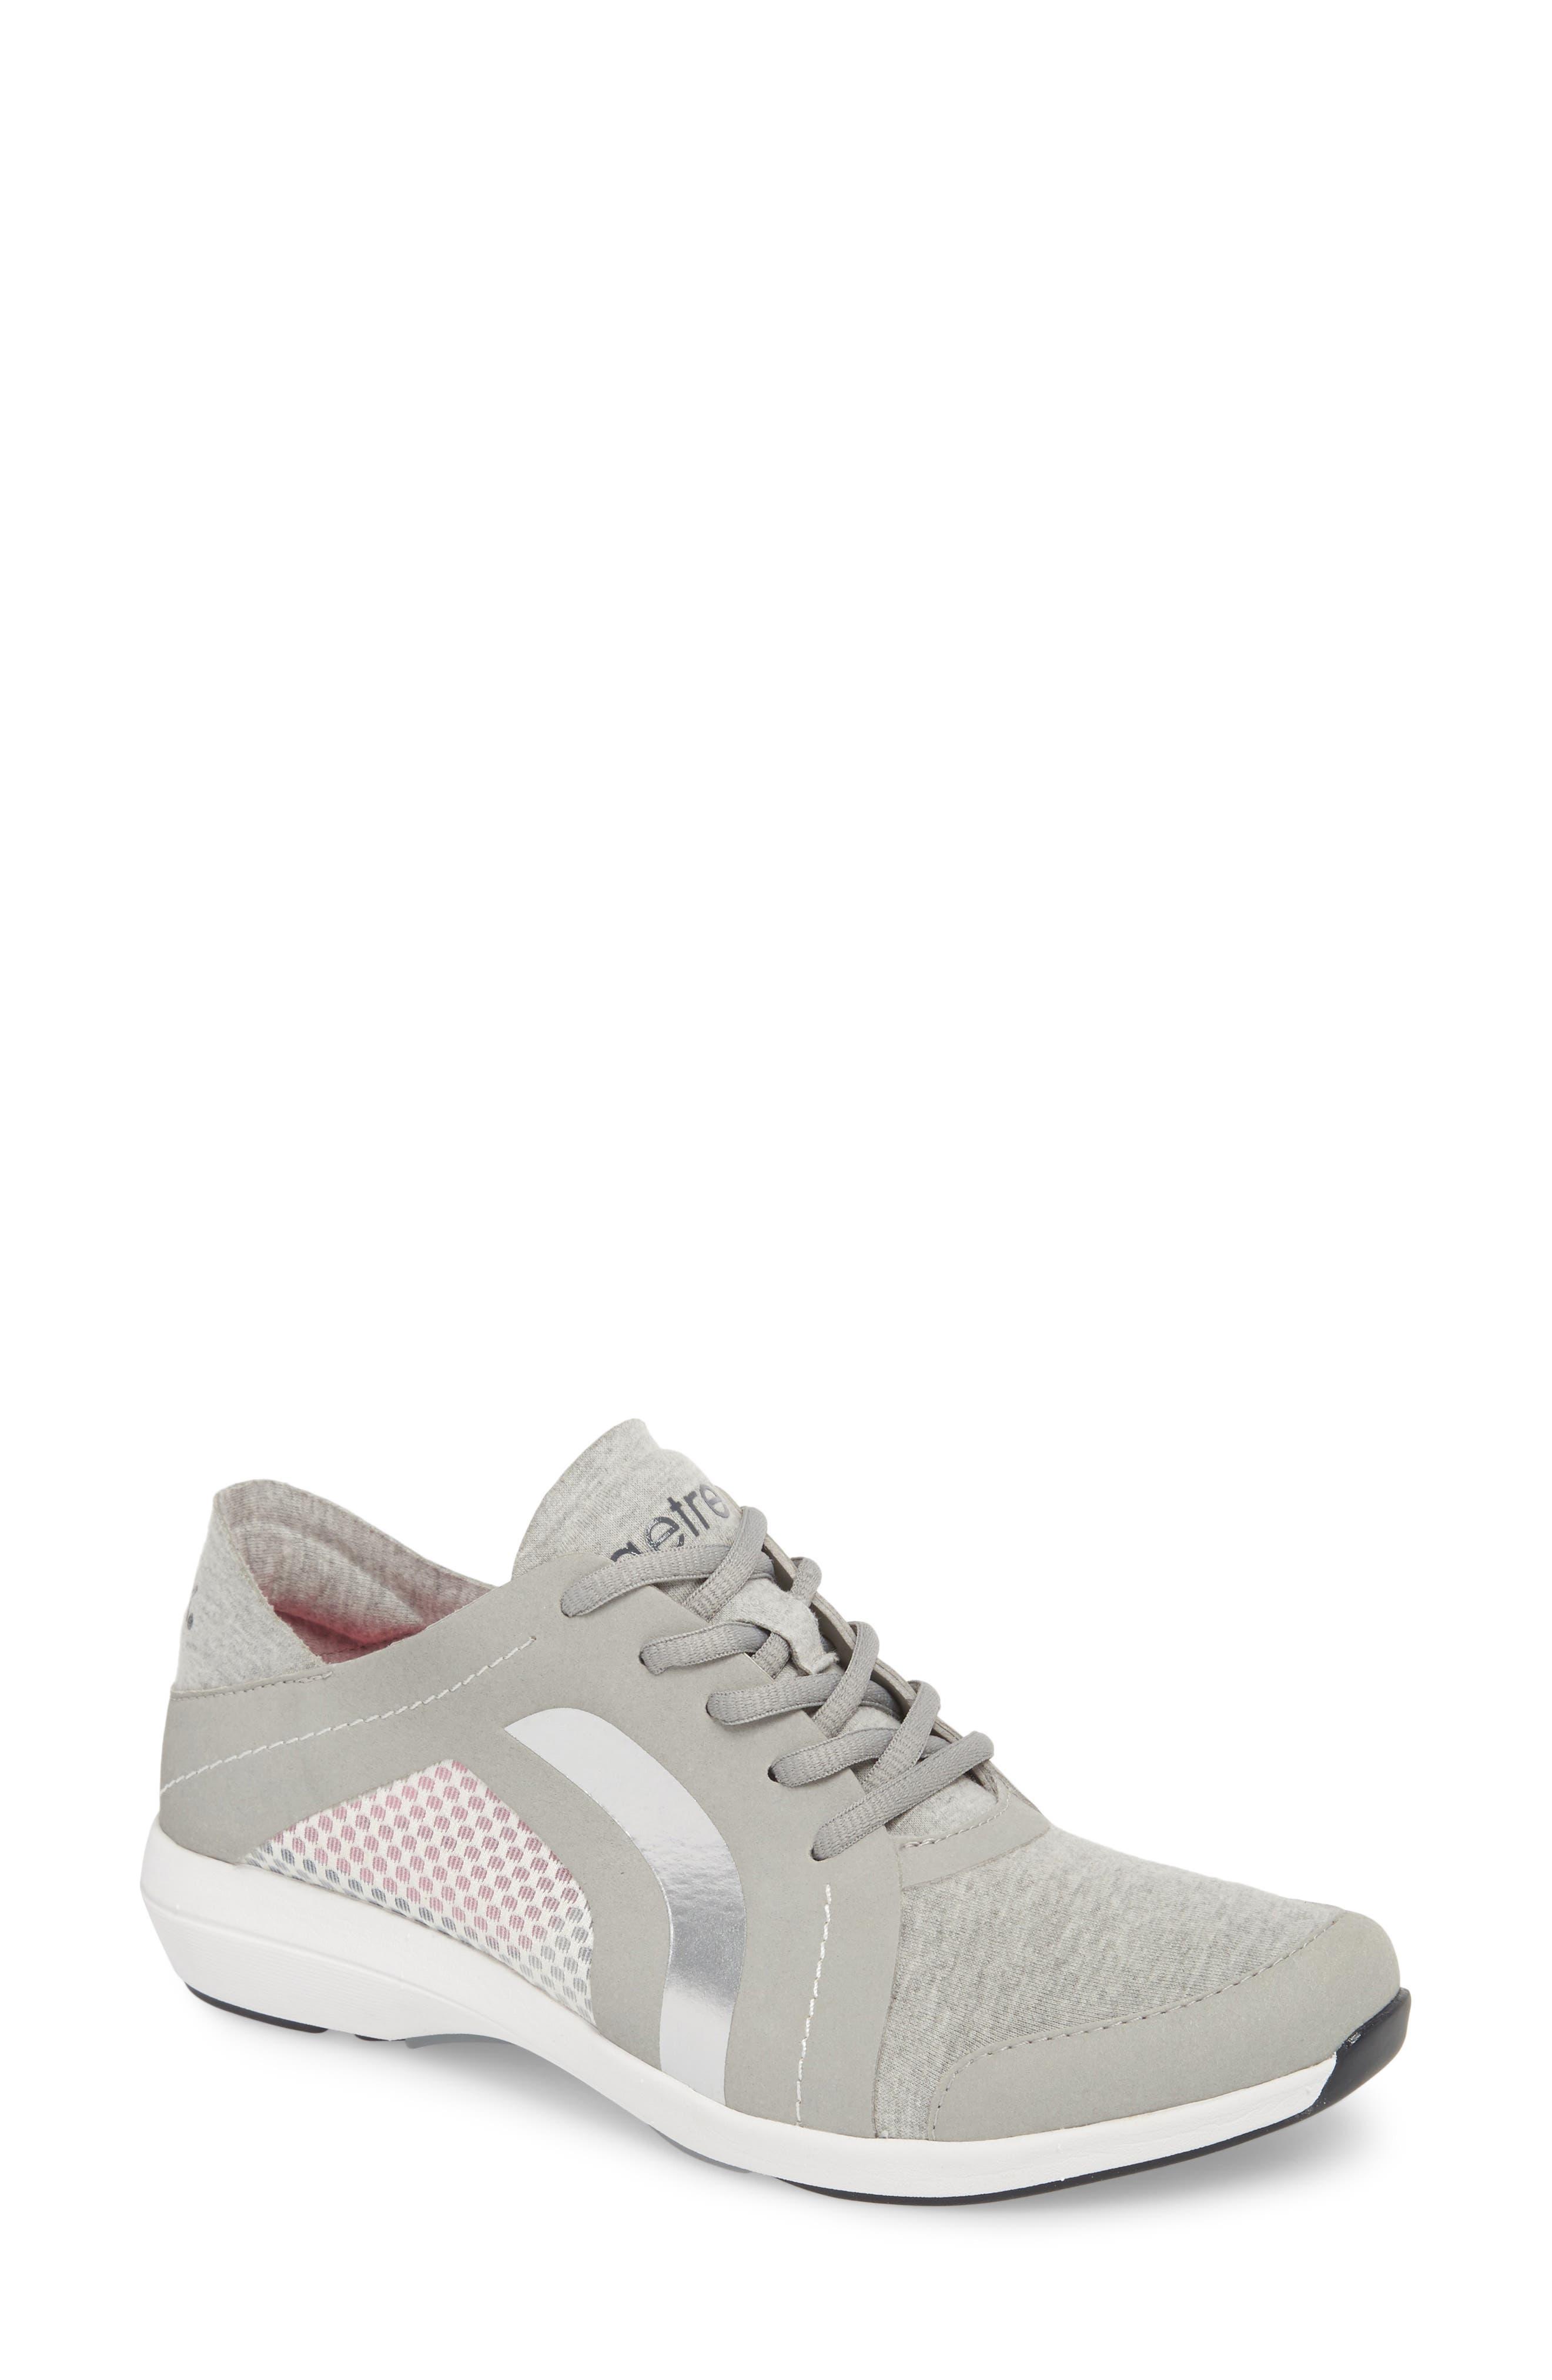 Sloane Sneaker,                             Main thumbnail 1, color,                             Grey Fabric